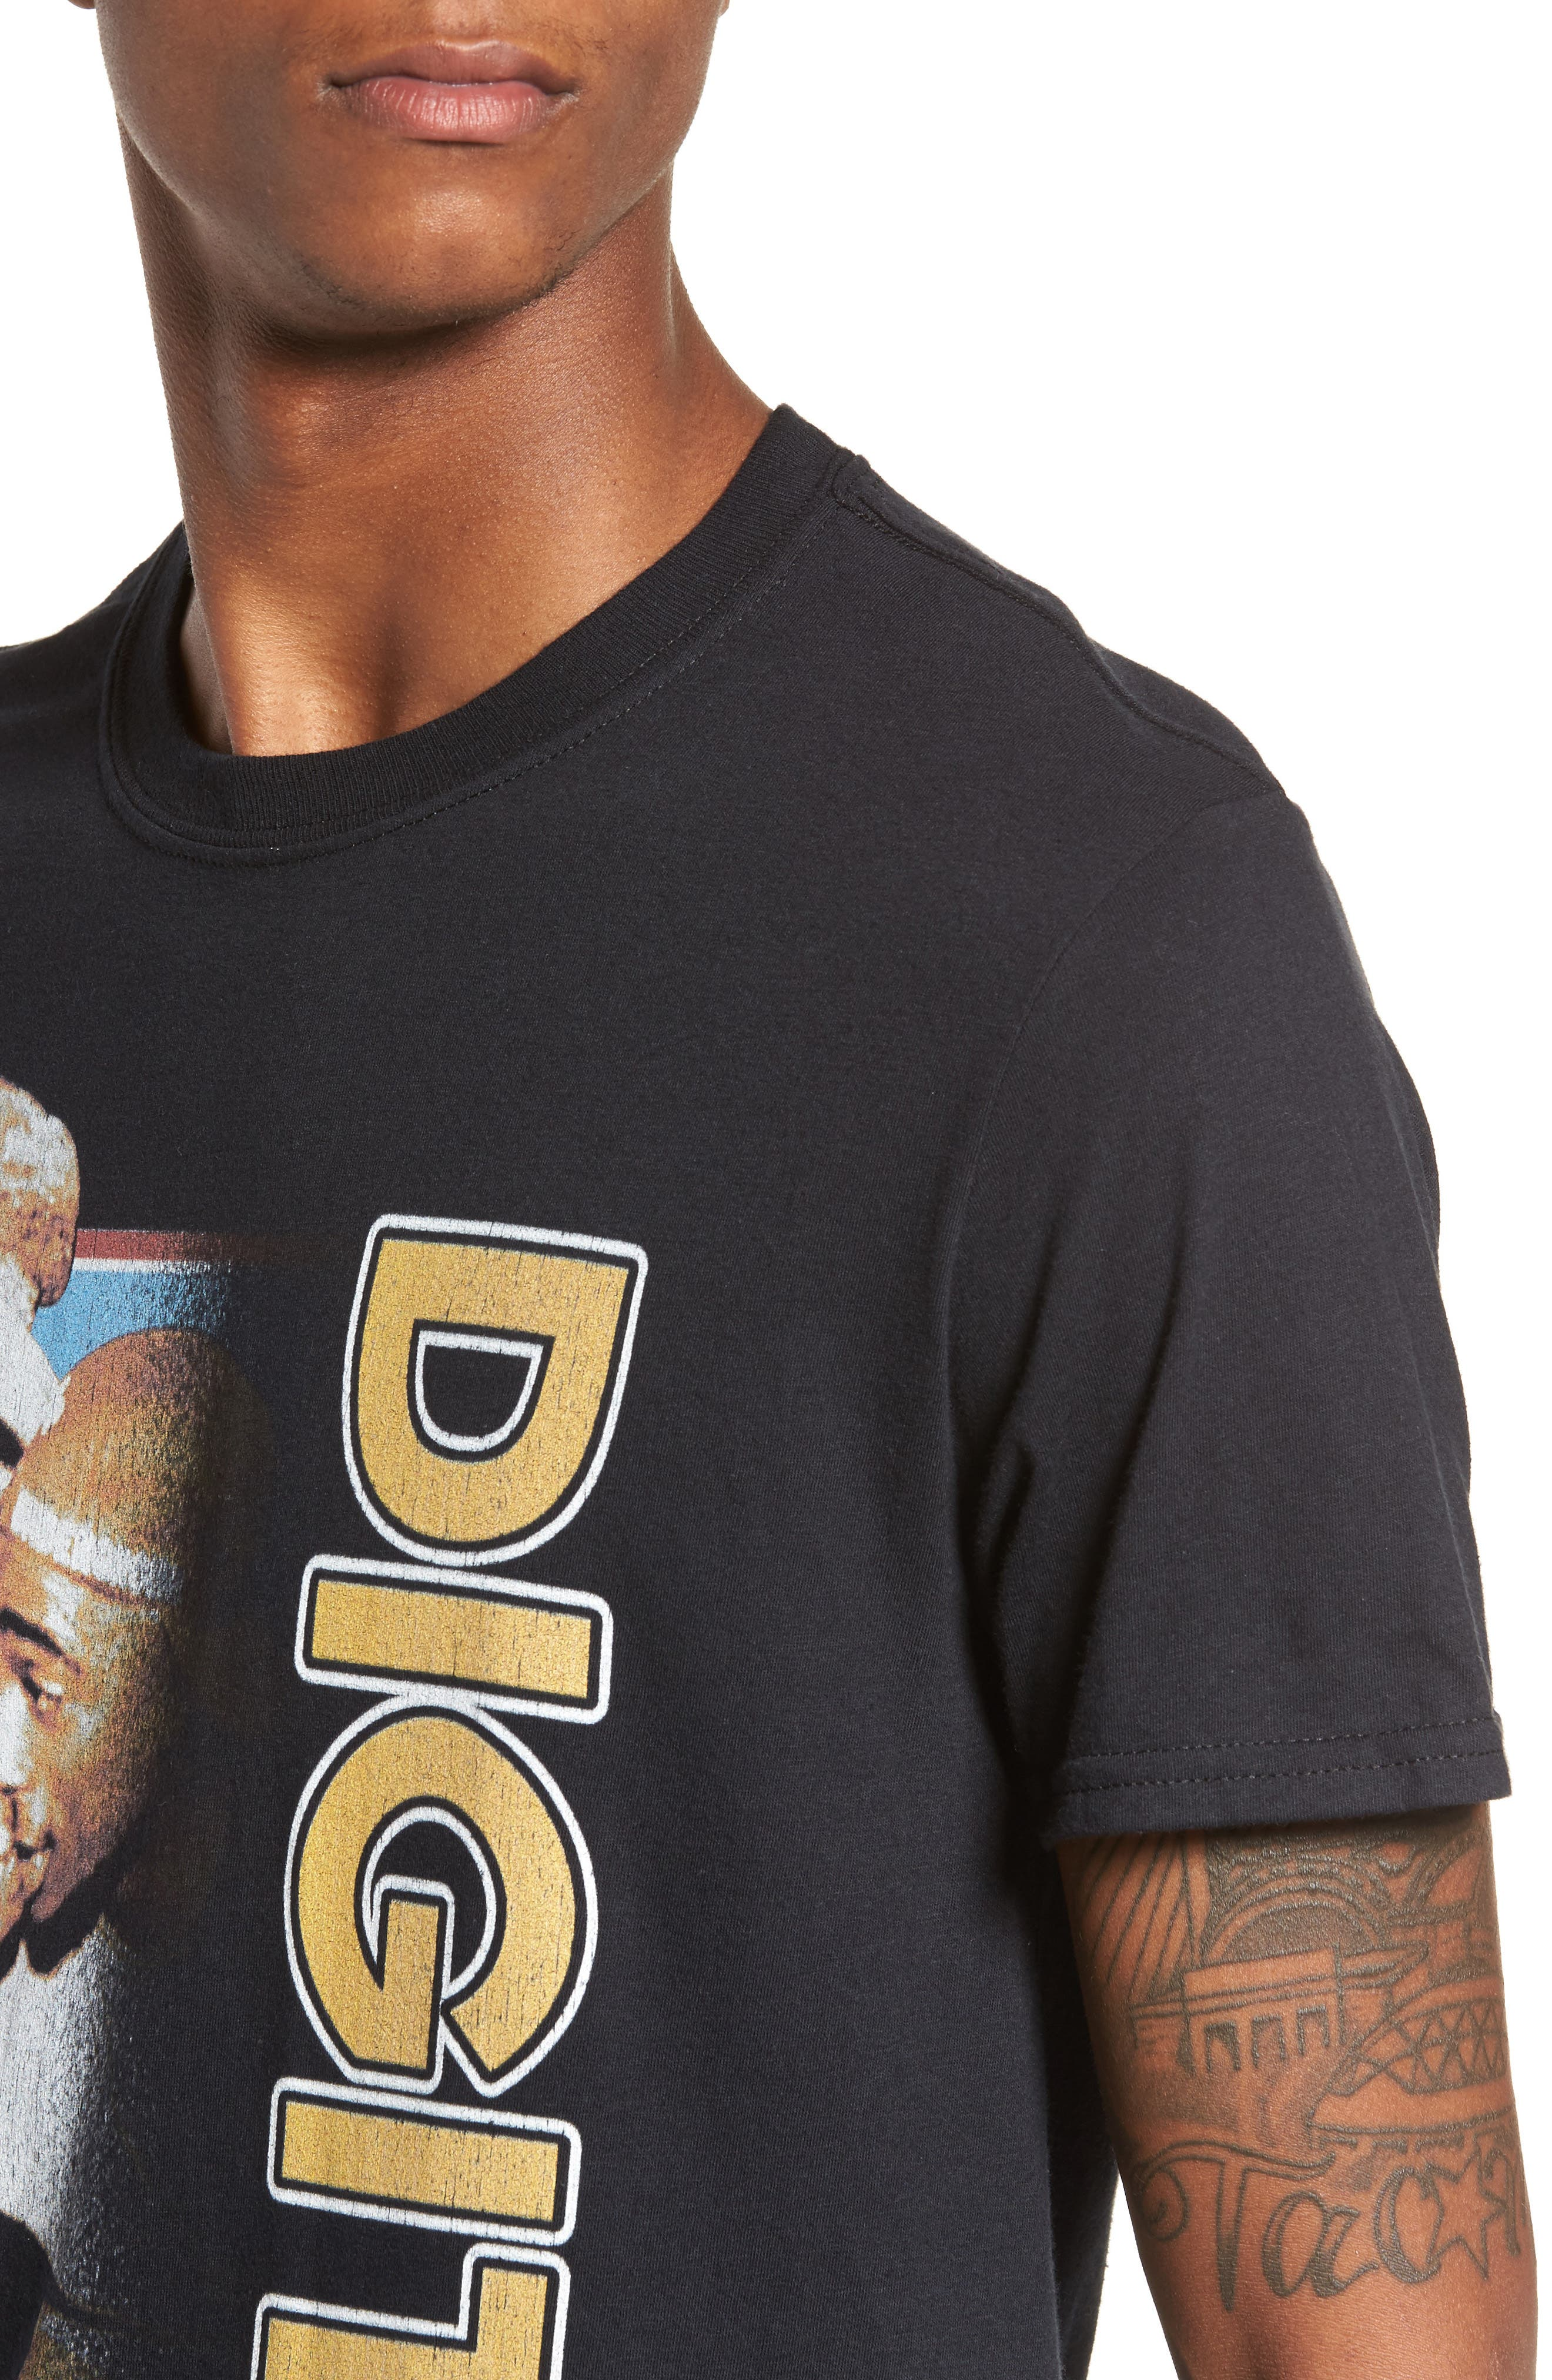 Digital Underground T-Shirt,                             Alternate thumbnail 4, color,                             Black Digital Underground